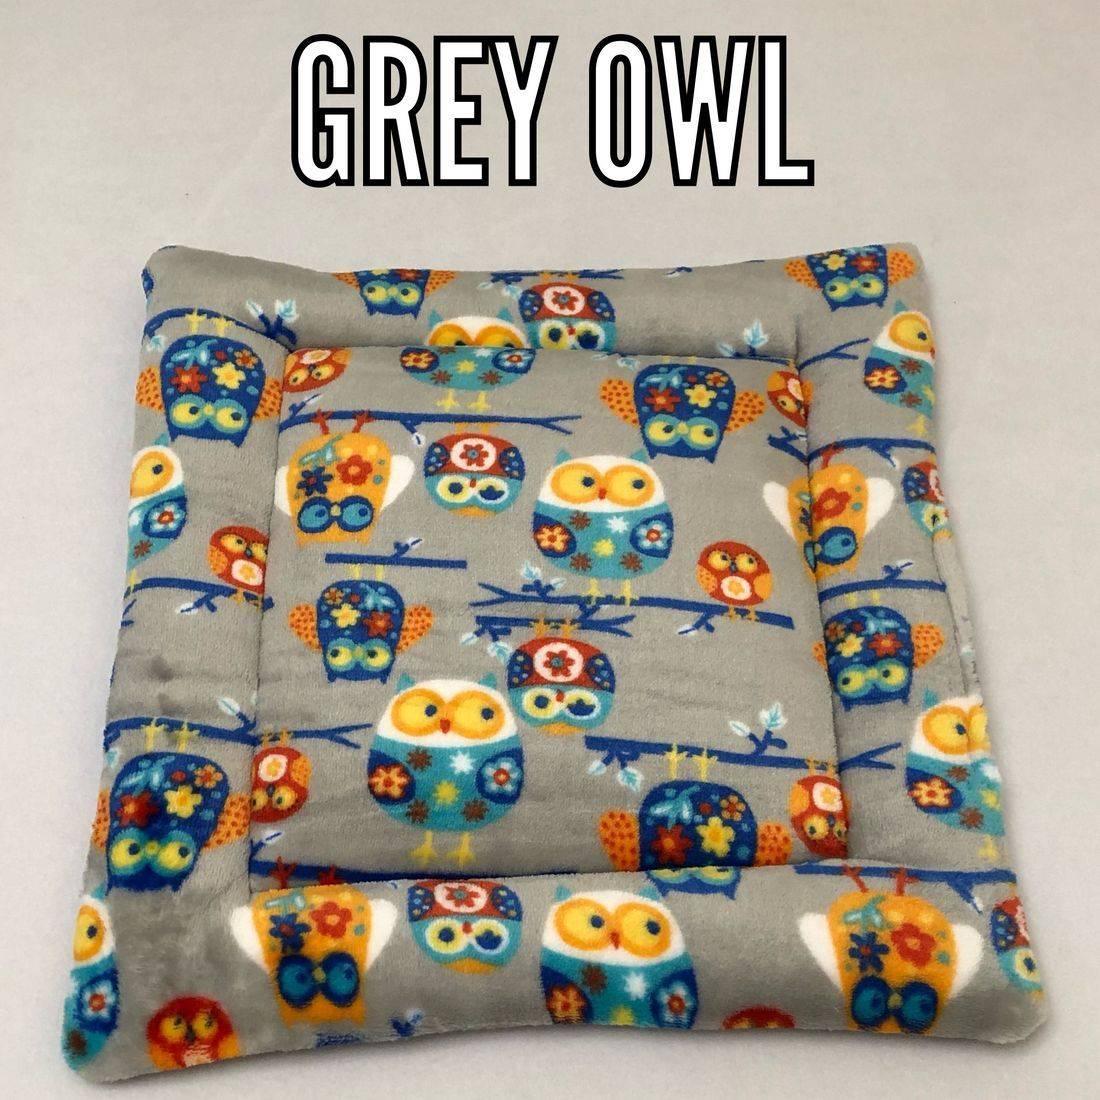 grey Owl fabric